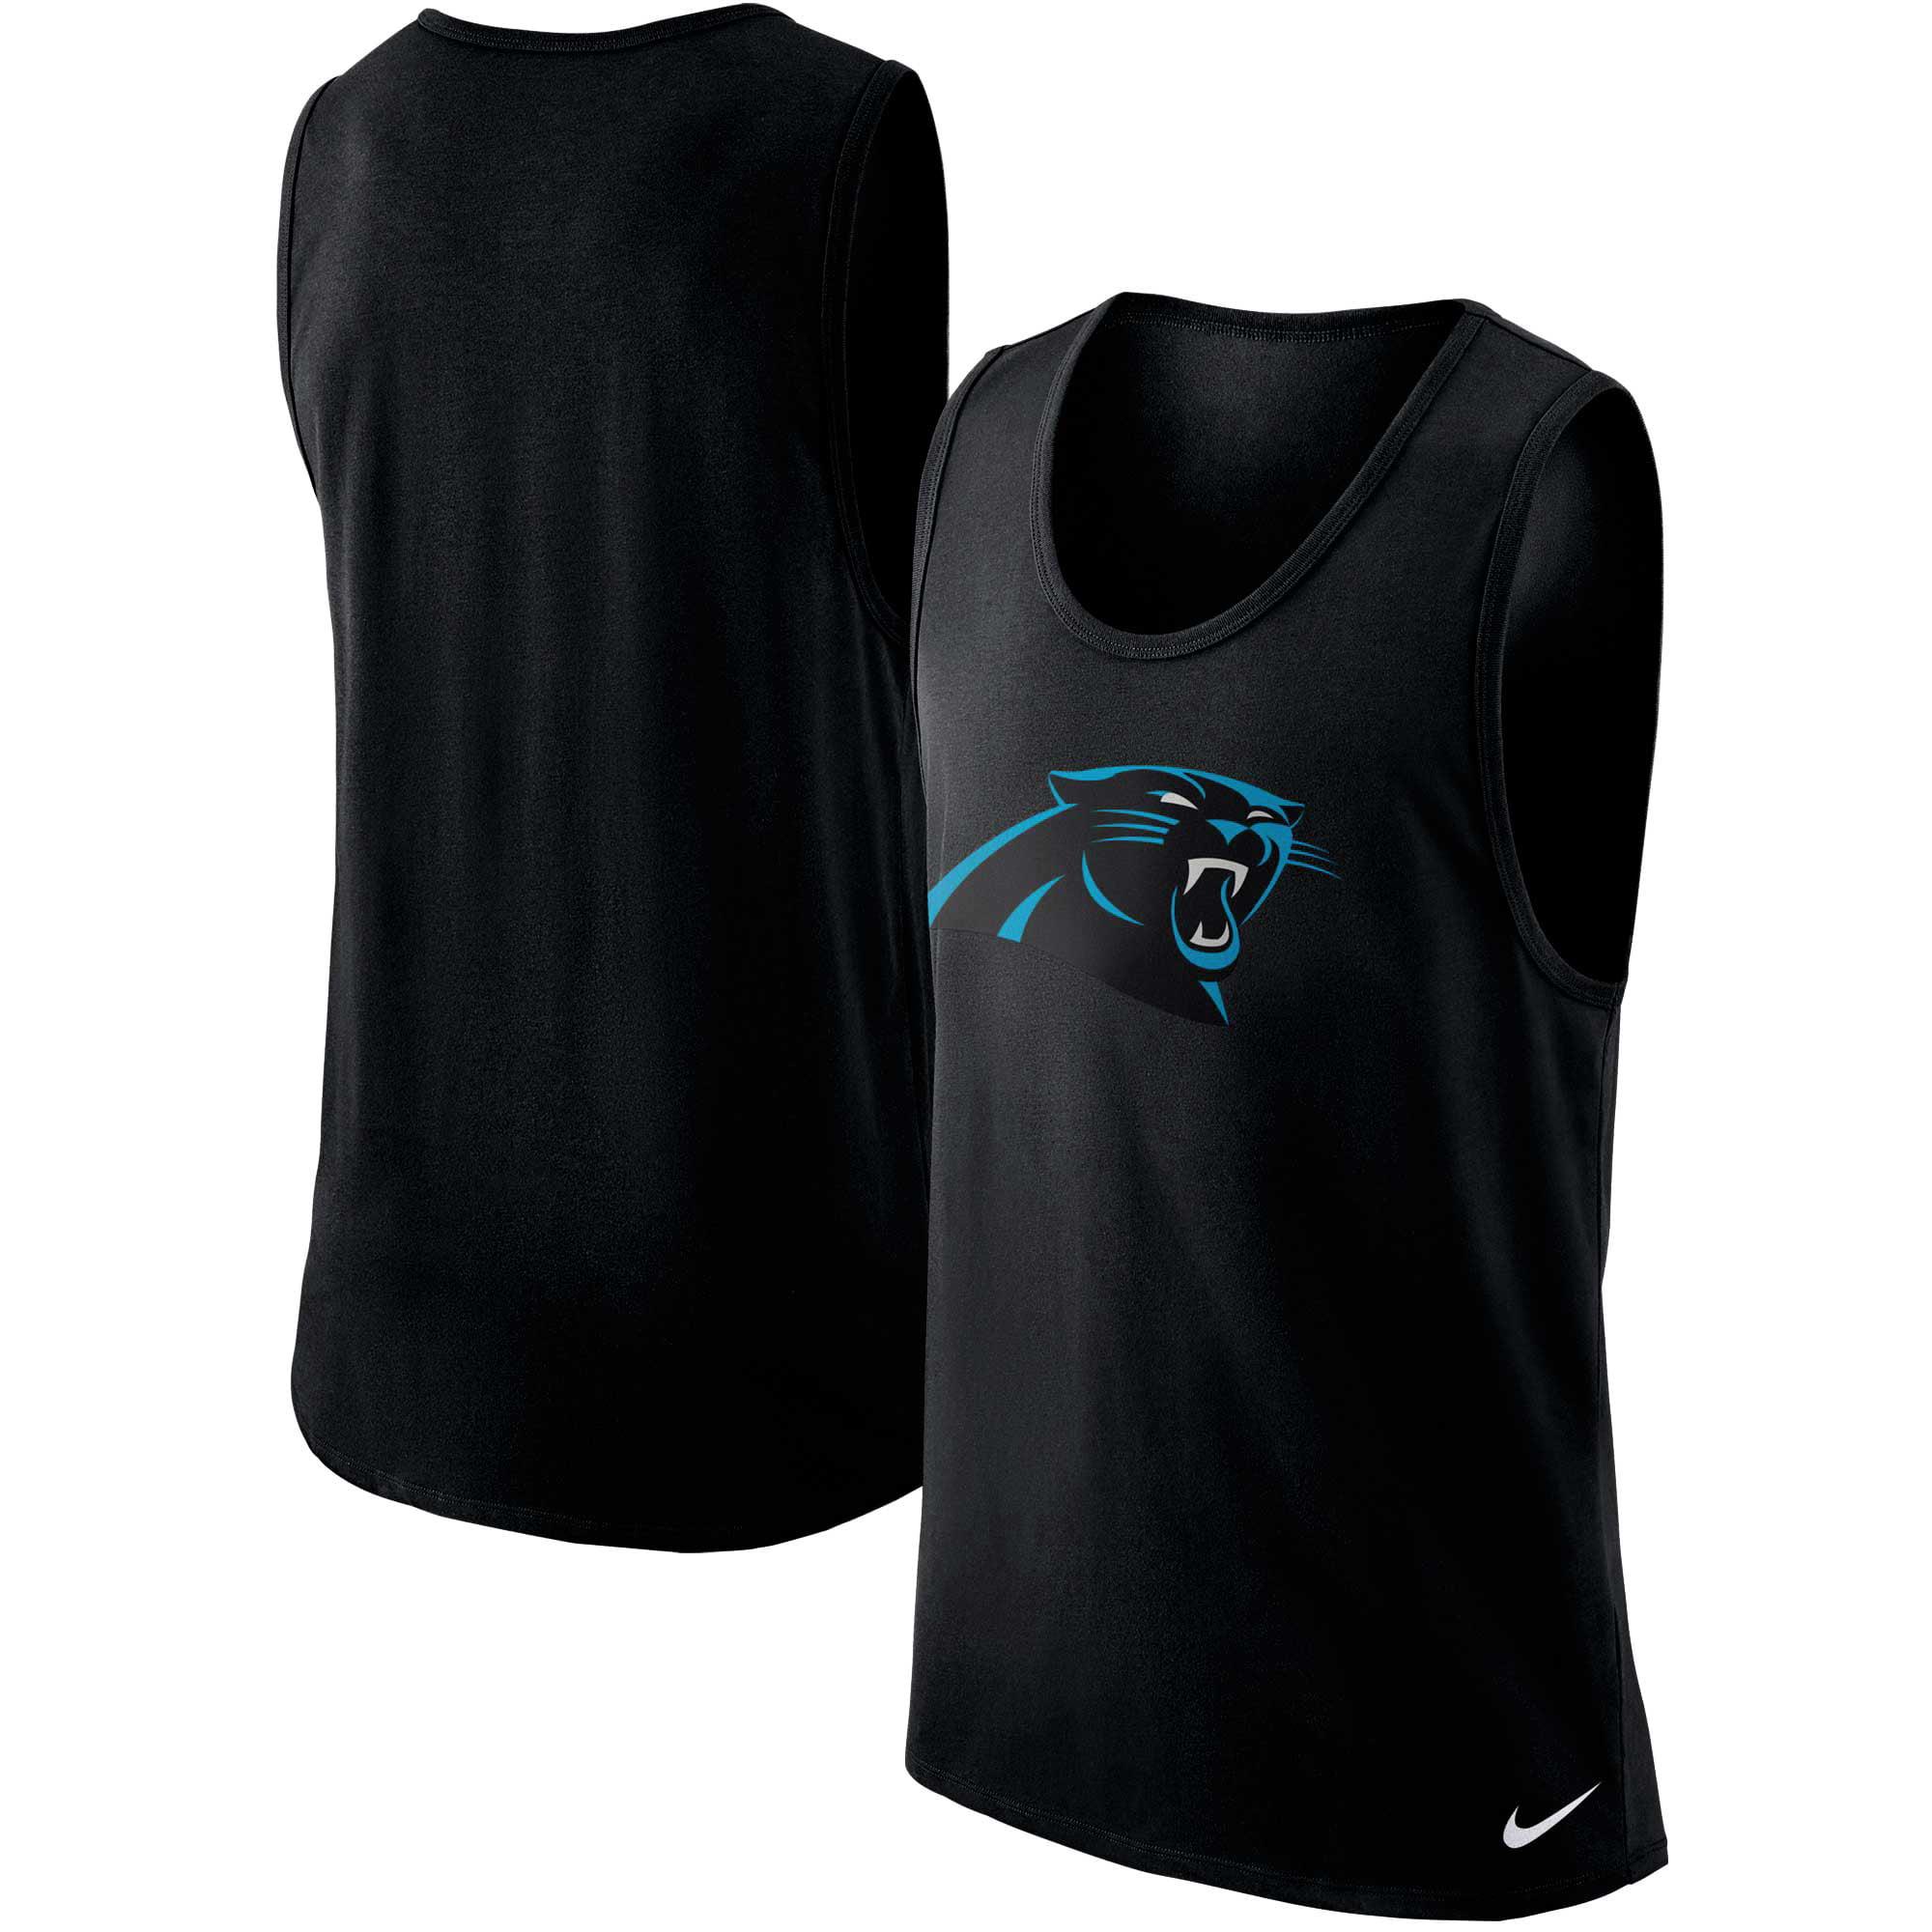 Carolina Panthers Nike Cotton Core Performance Tank Top - Black